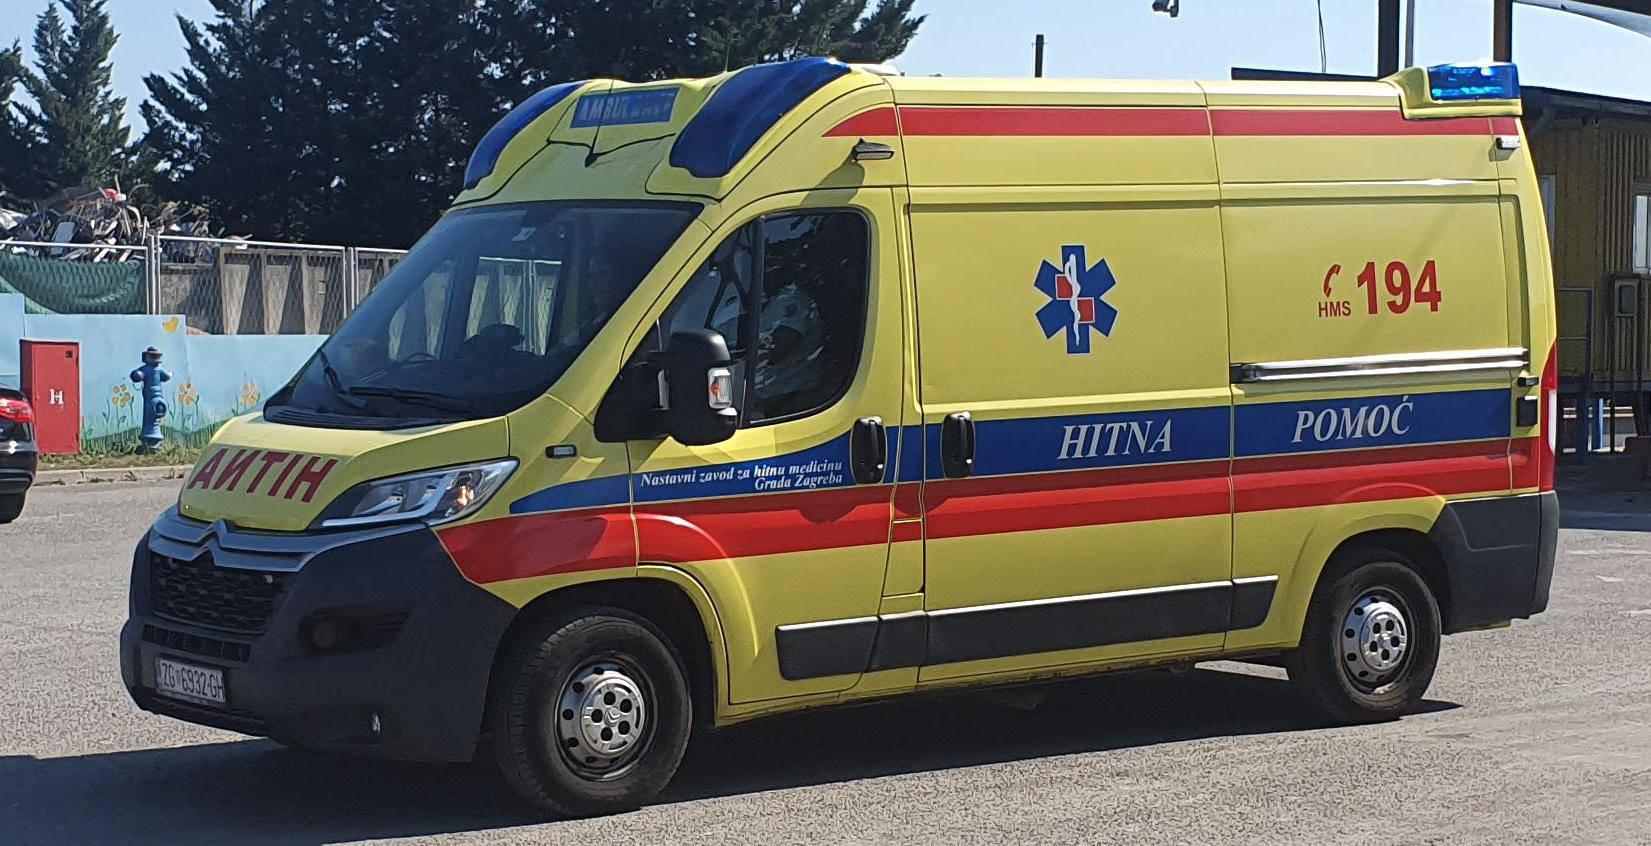 Smrtno stradao motorist kod Plitvica: Sudario se s BMW-om